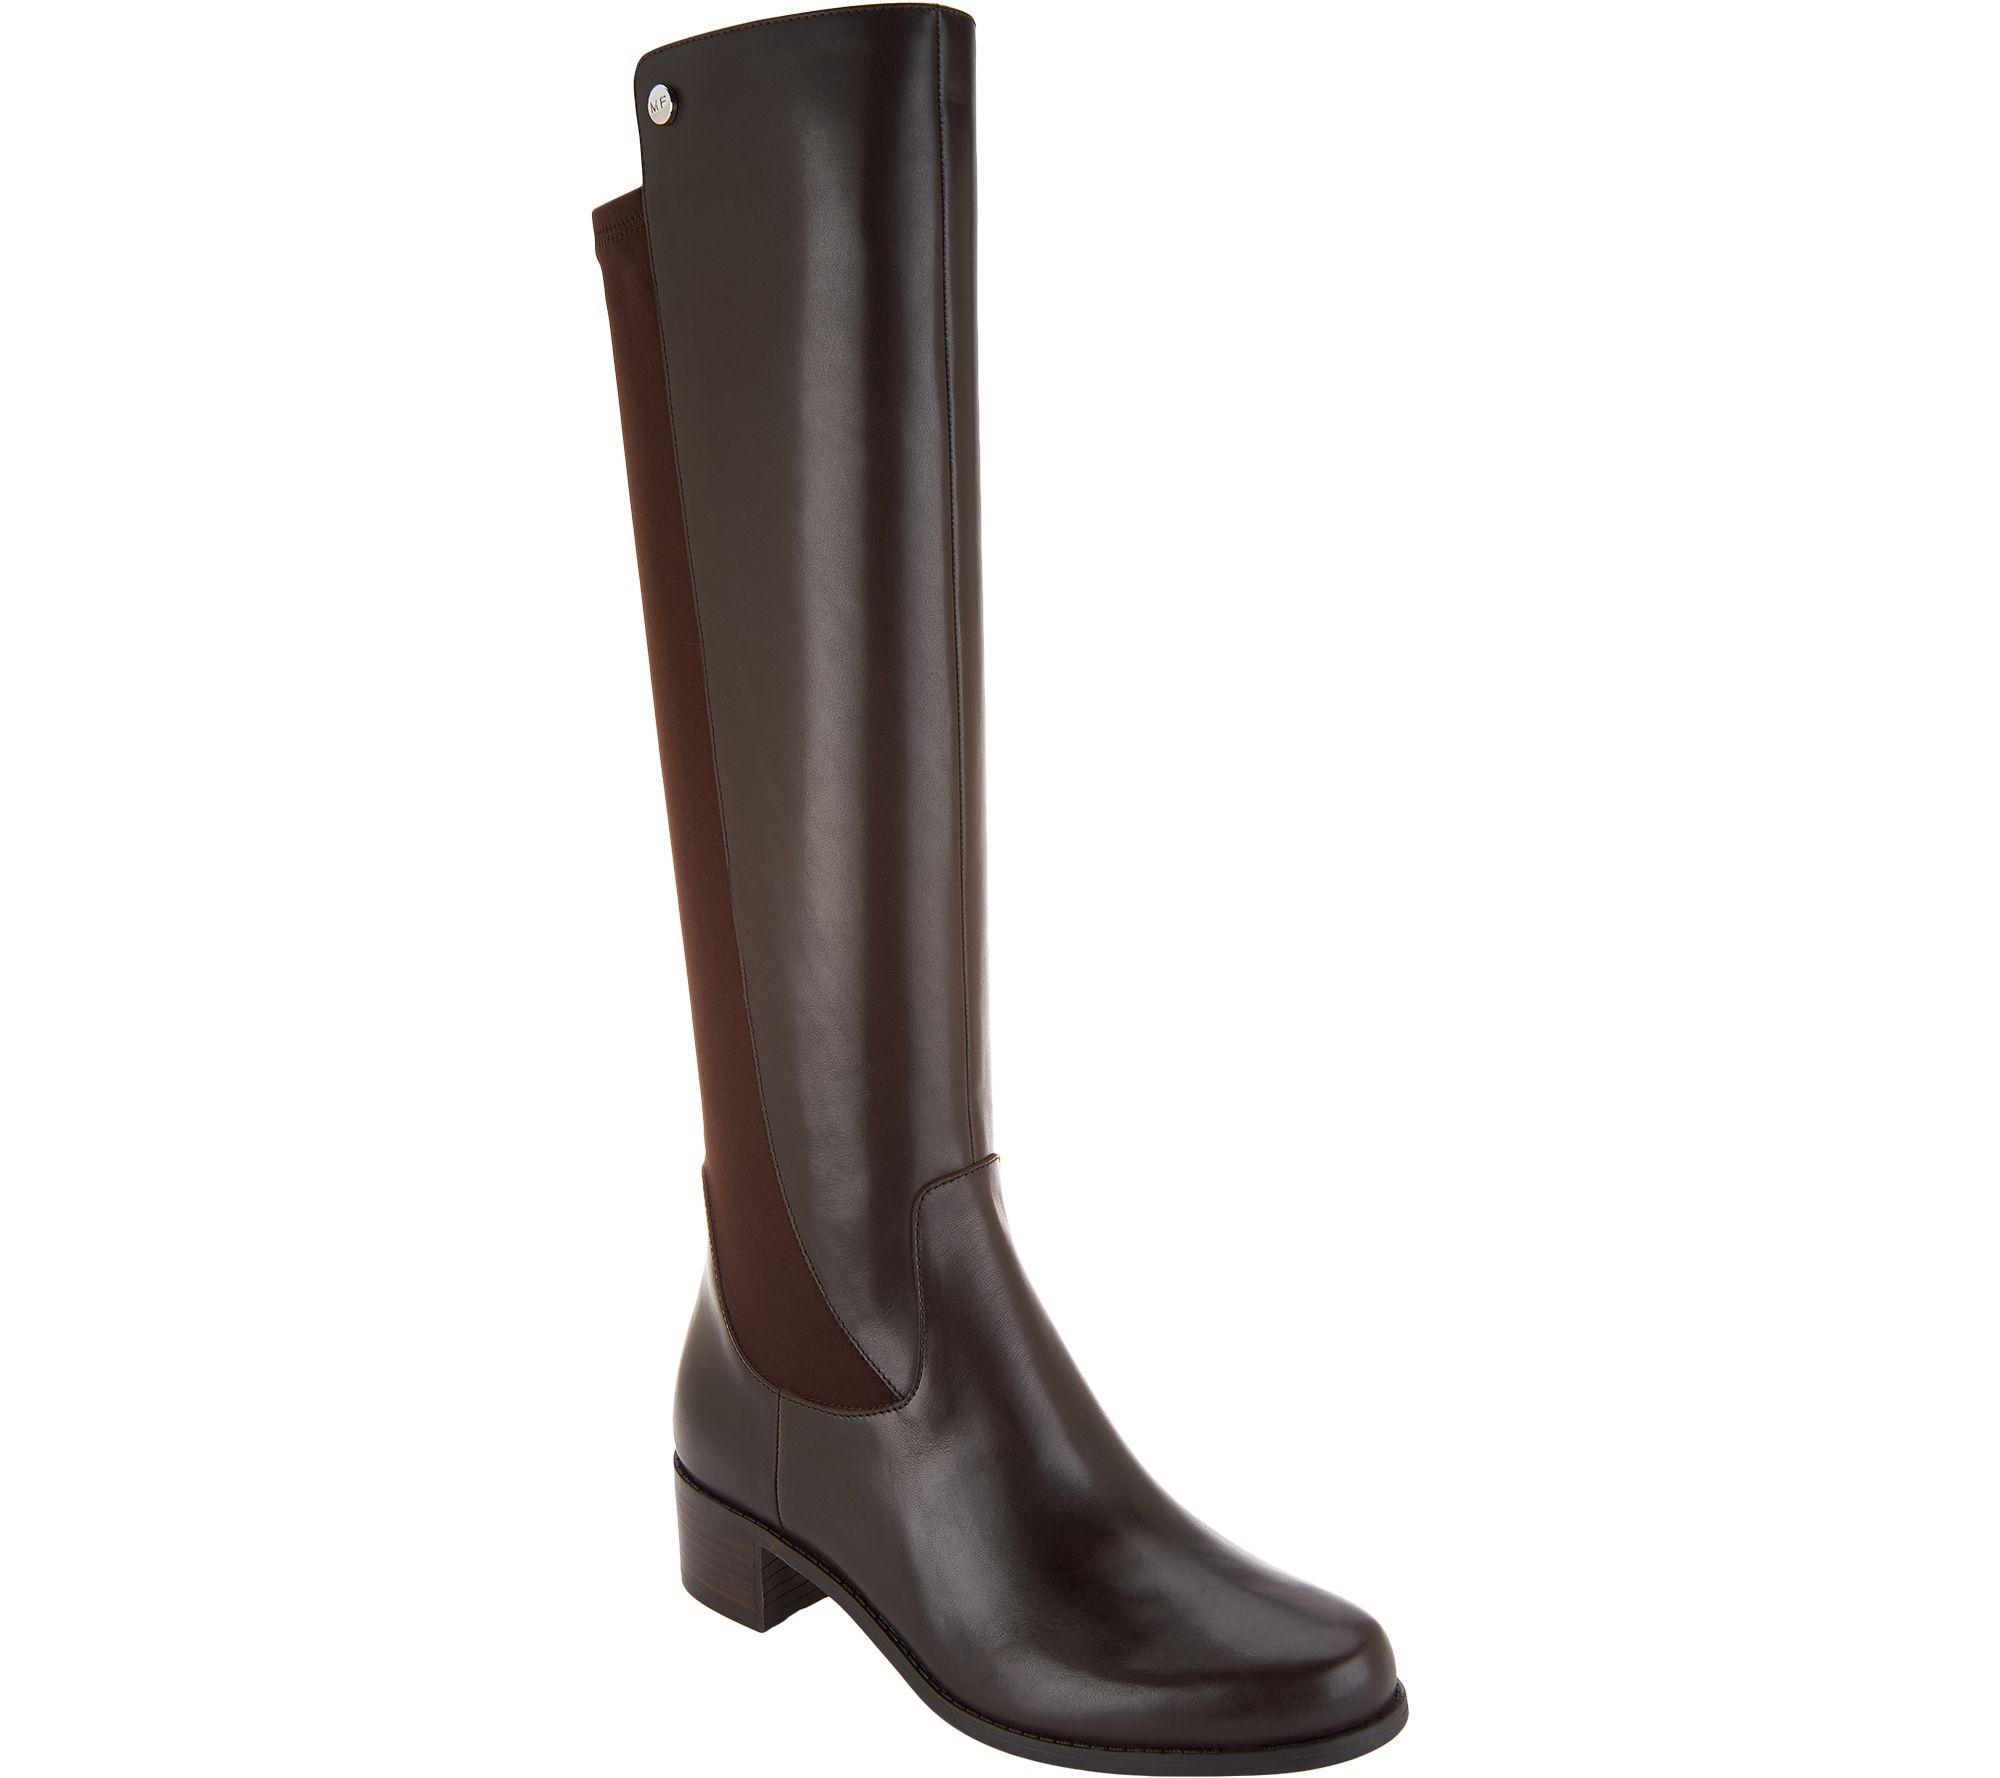 e1eeb7f18 Marc Fisher Medium Calf Leather Tall Shaft Boots - Incept - Page 1 — QVC.com